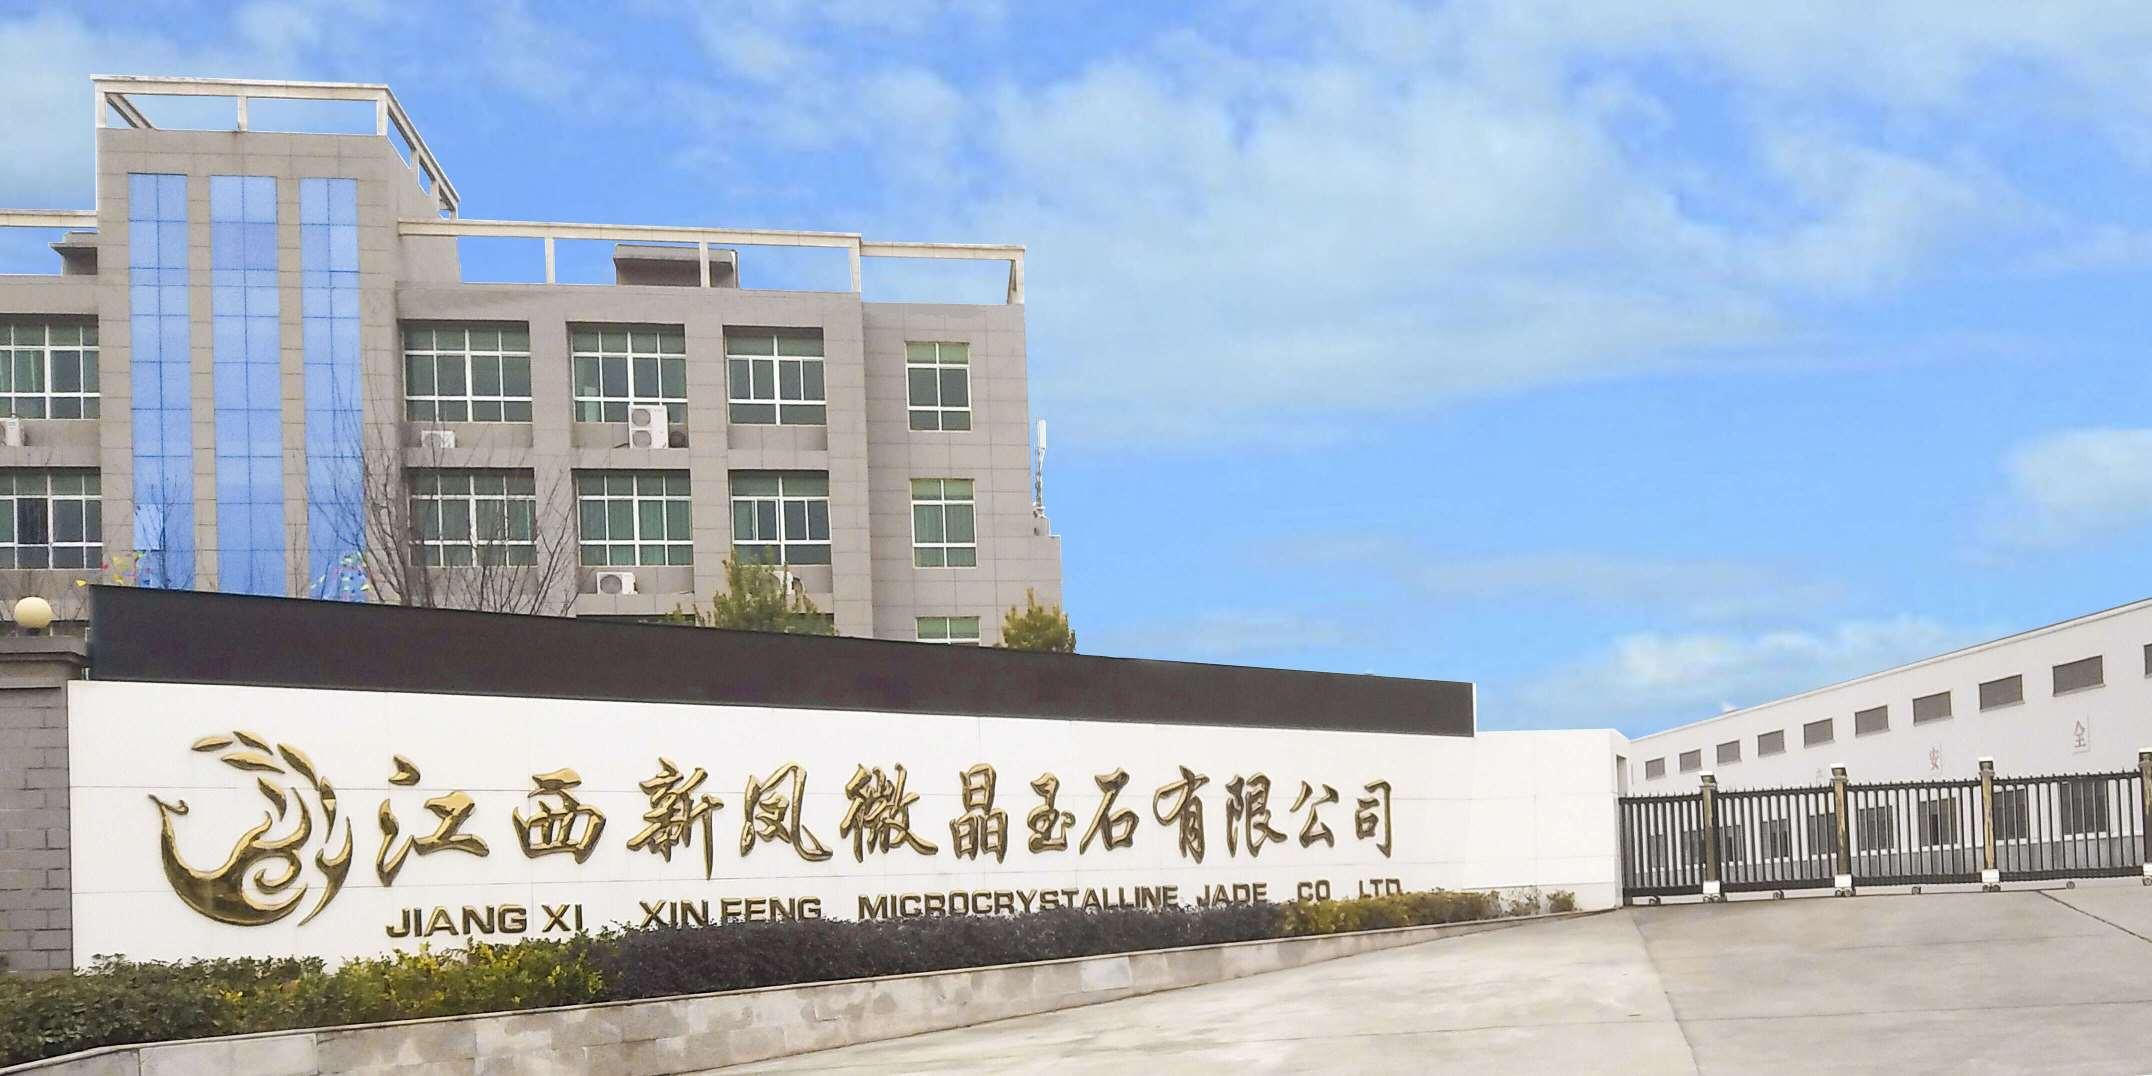 Jiangxi Xinfeng Microcrystalline Jade Co., Ltd